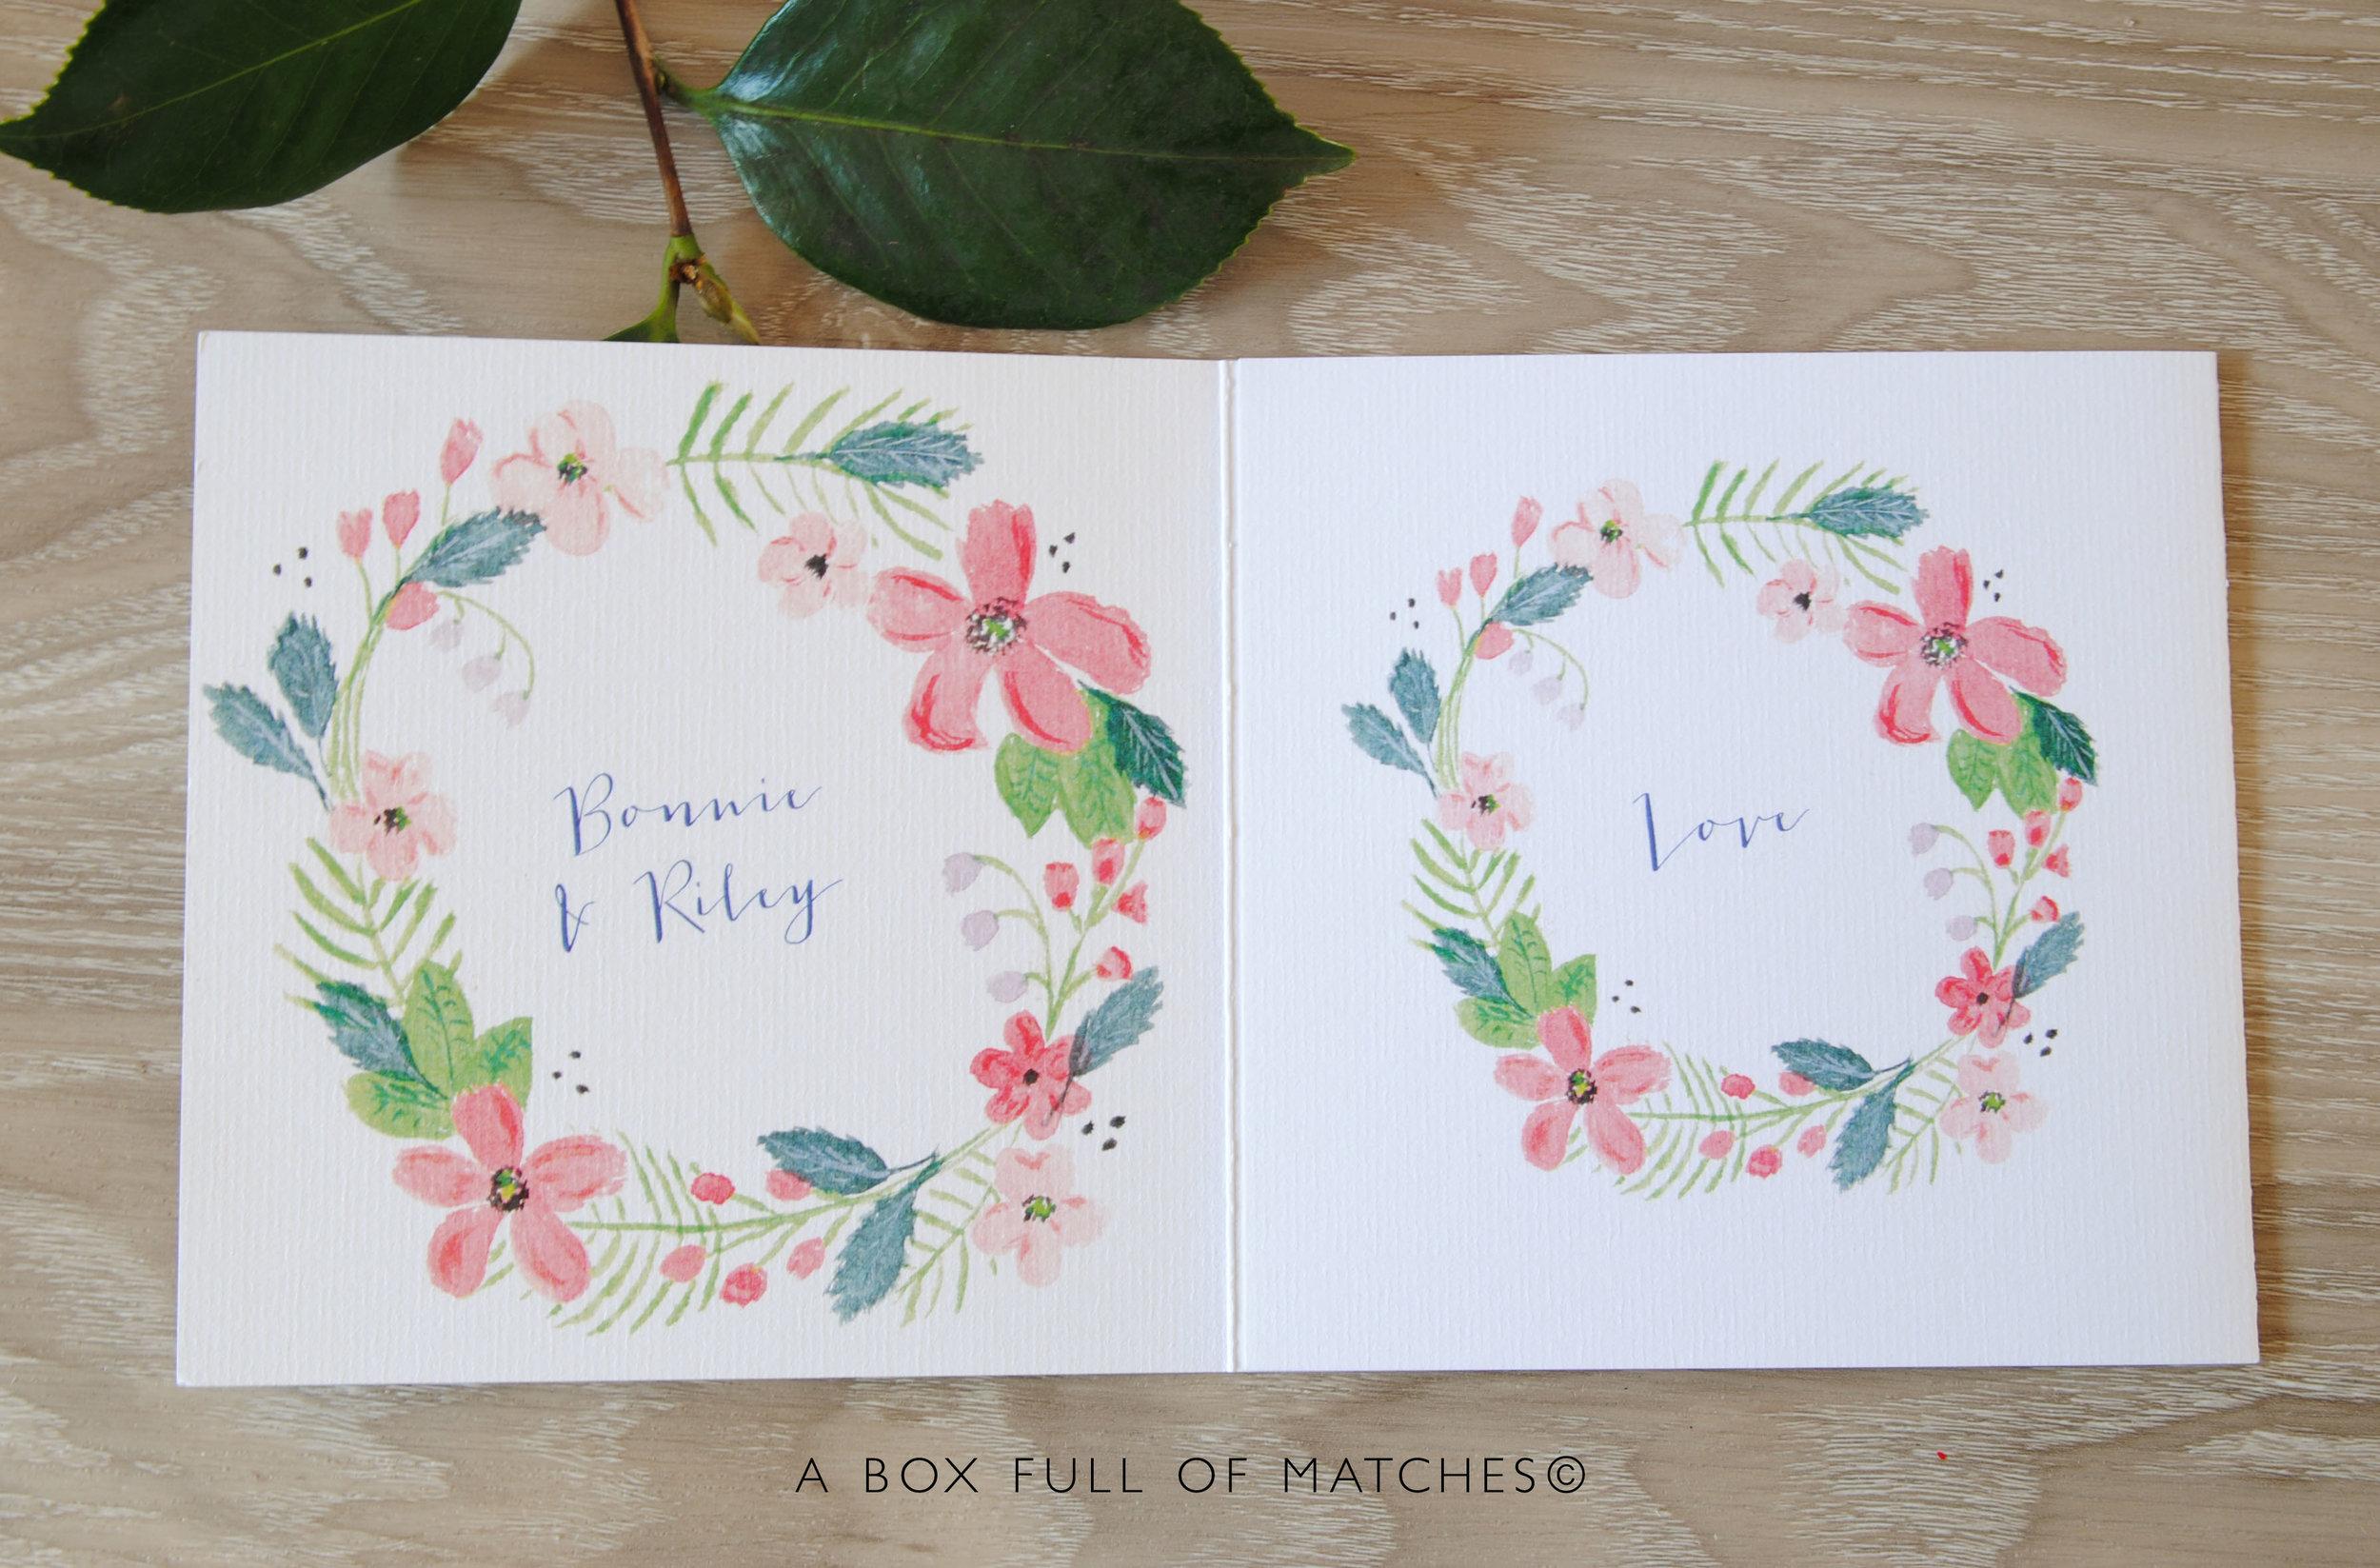 WEDDING-INVITATION-WREATH-02.jpg